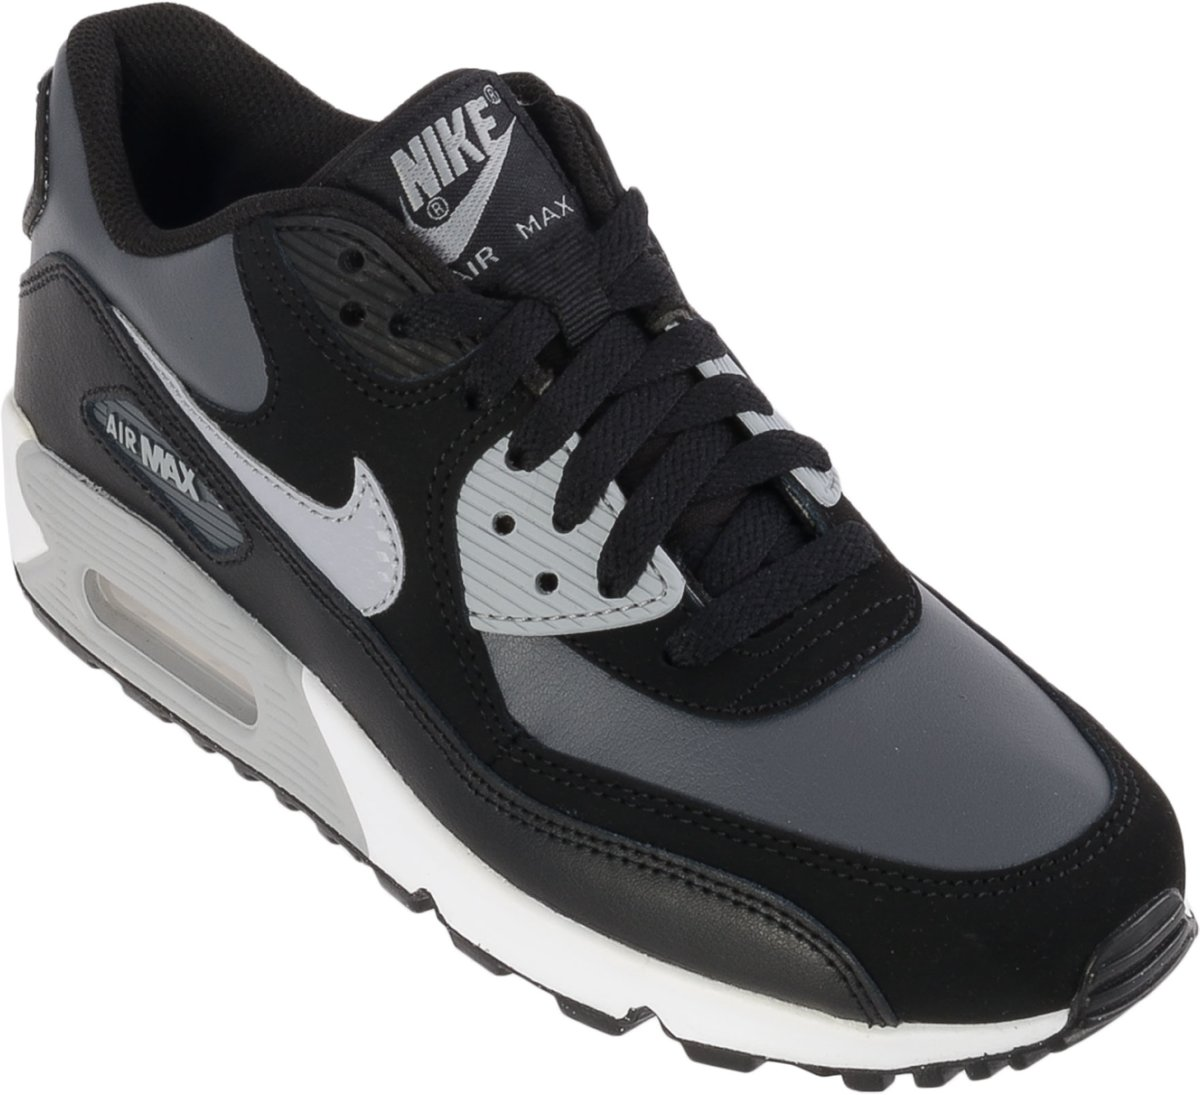 goedkope nike air max dames maat 37 nike air max schoenen. Black Bedroom Furniture Sets. Home Design Ideas